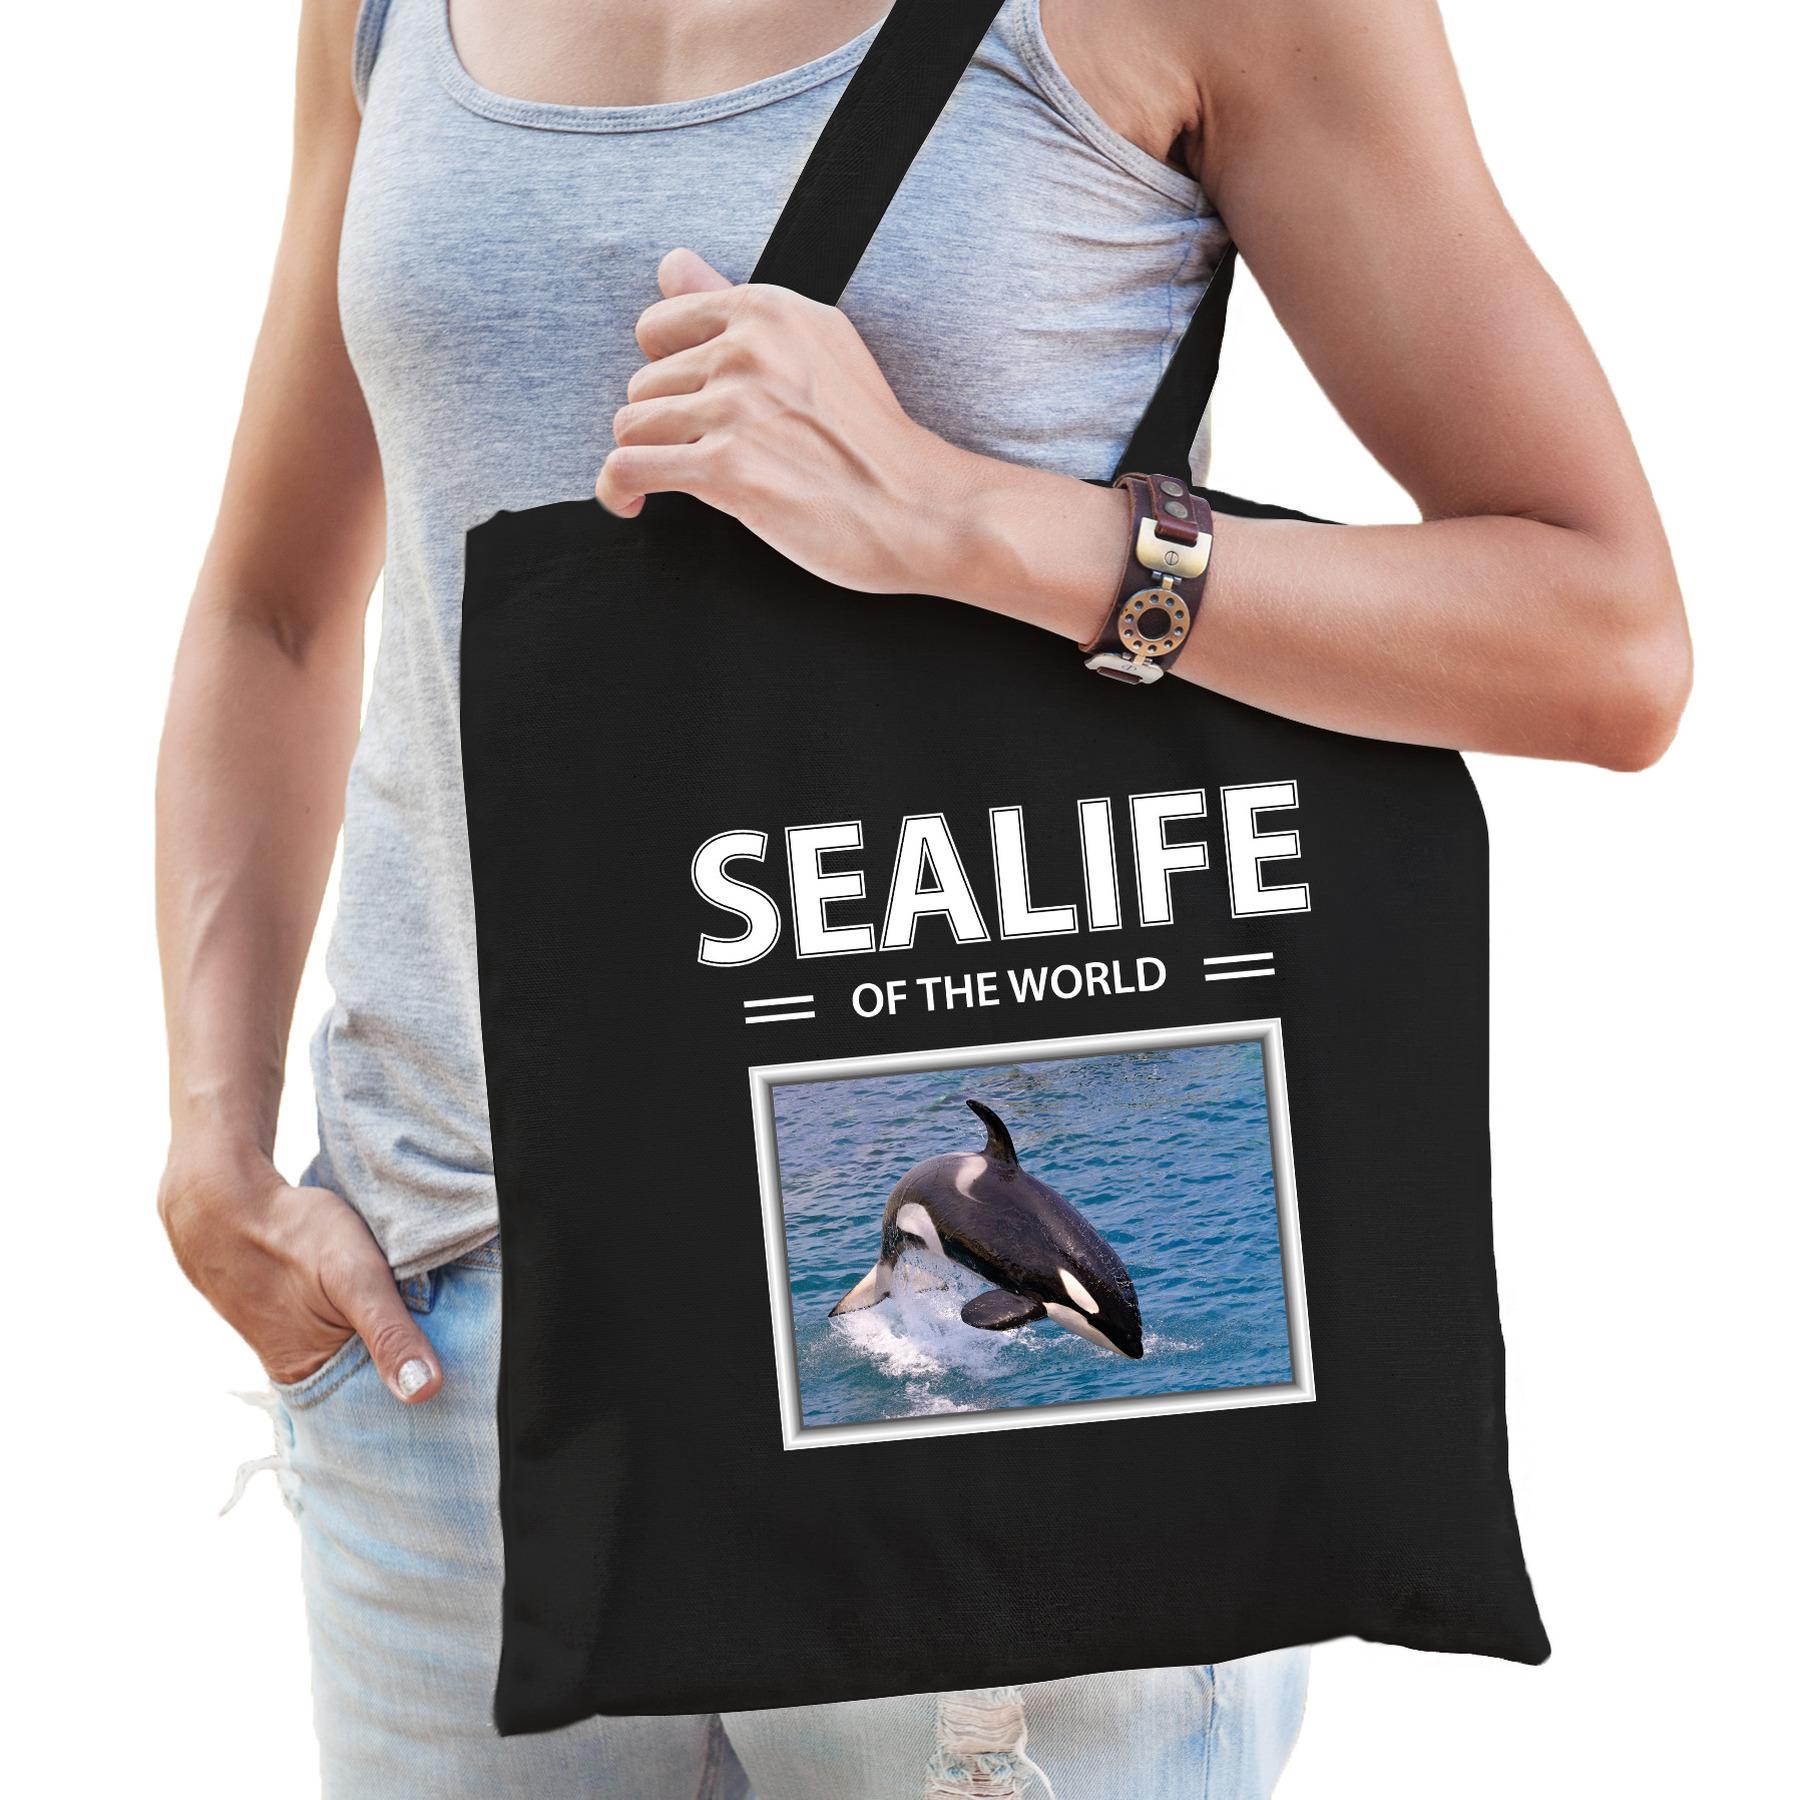 Katoenen tasje Orka zwart - sealife of the world Orkas cadeau tas